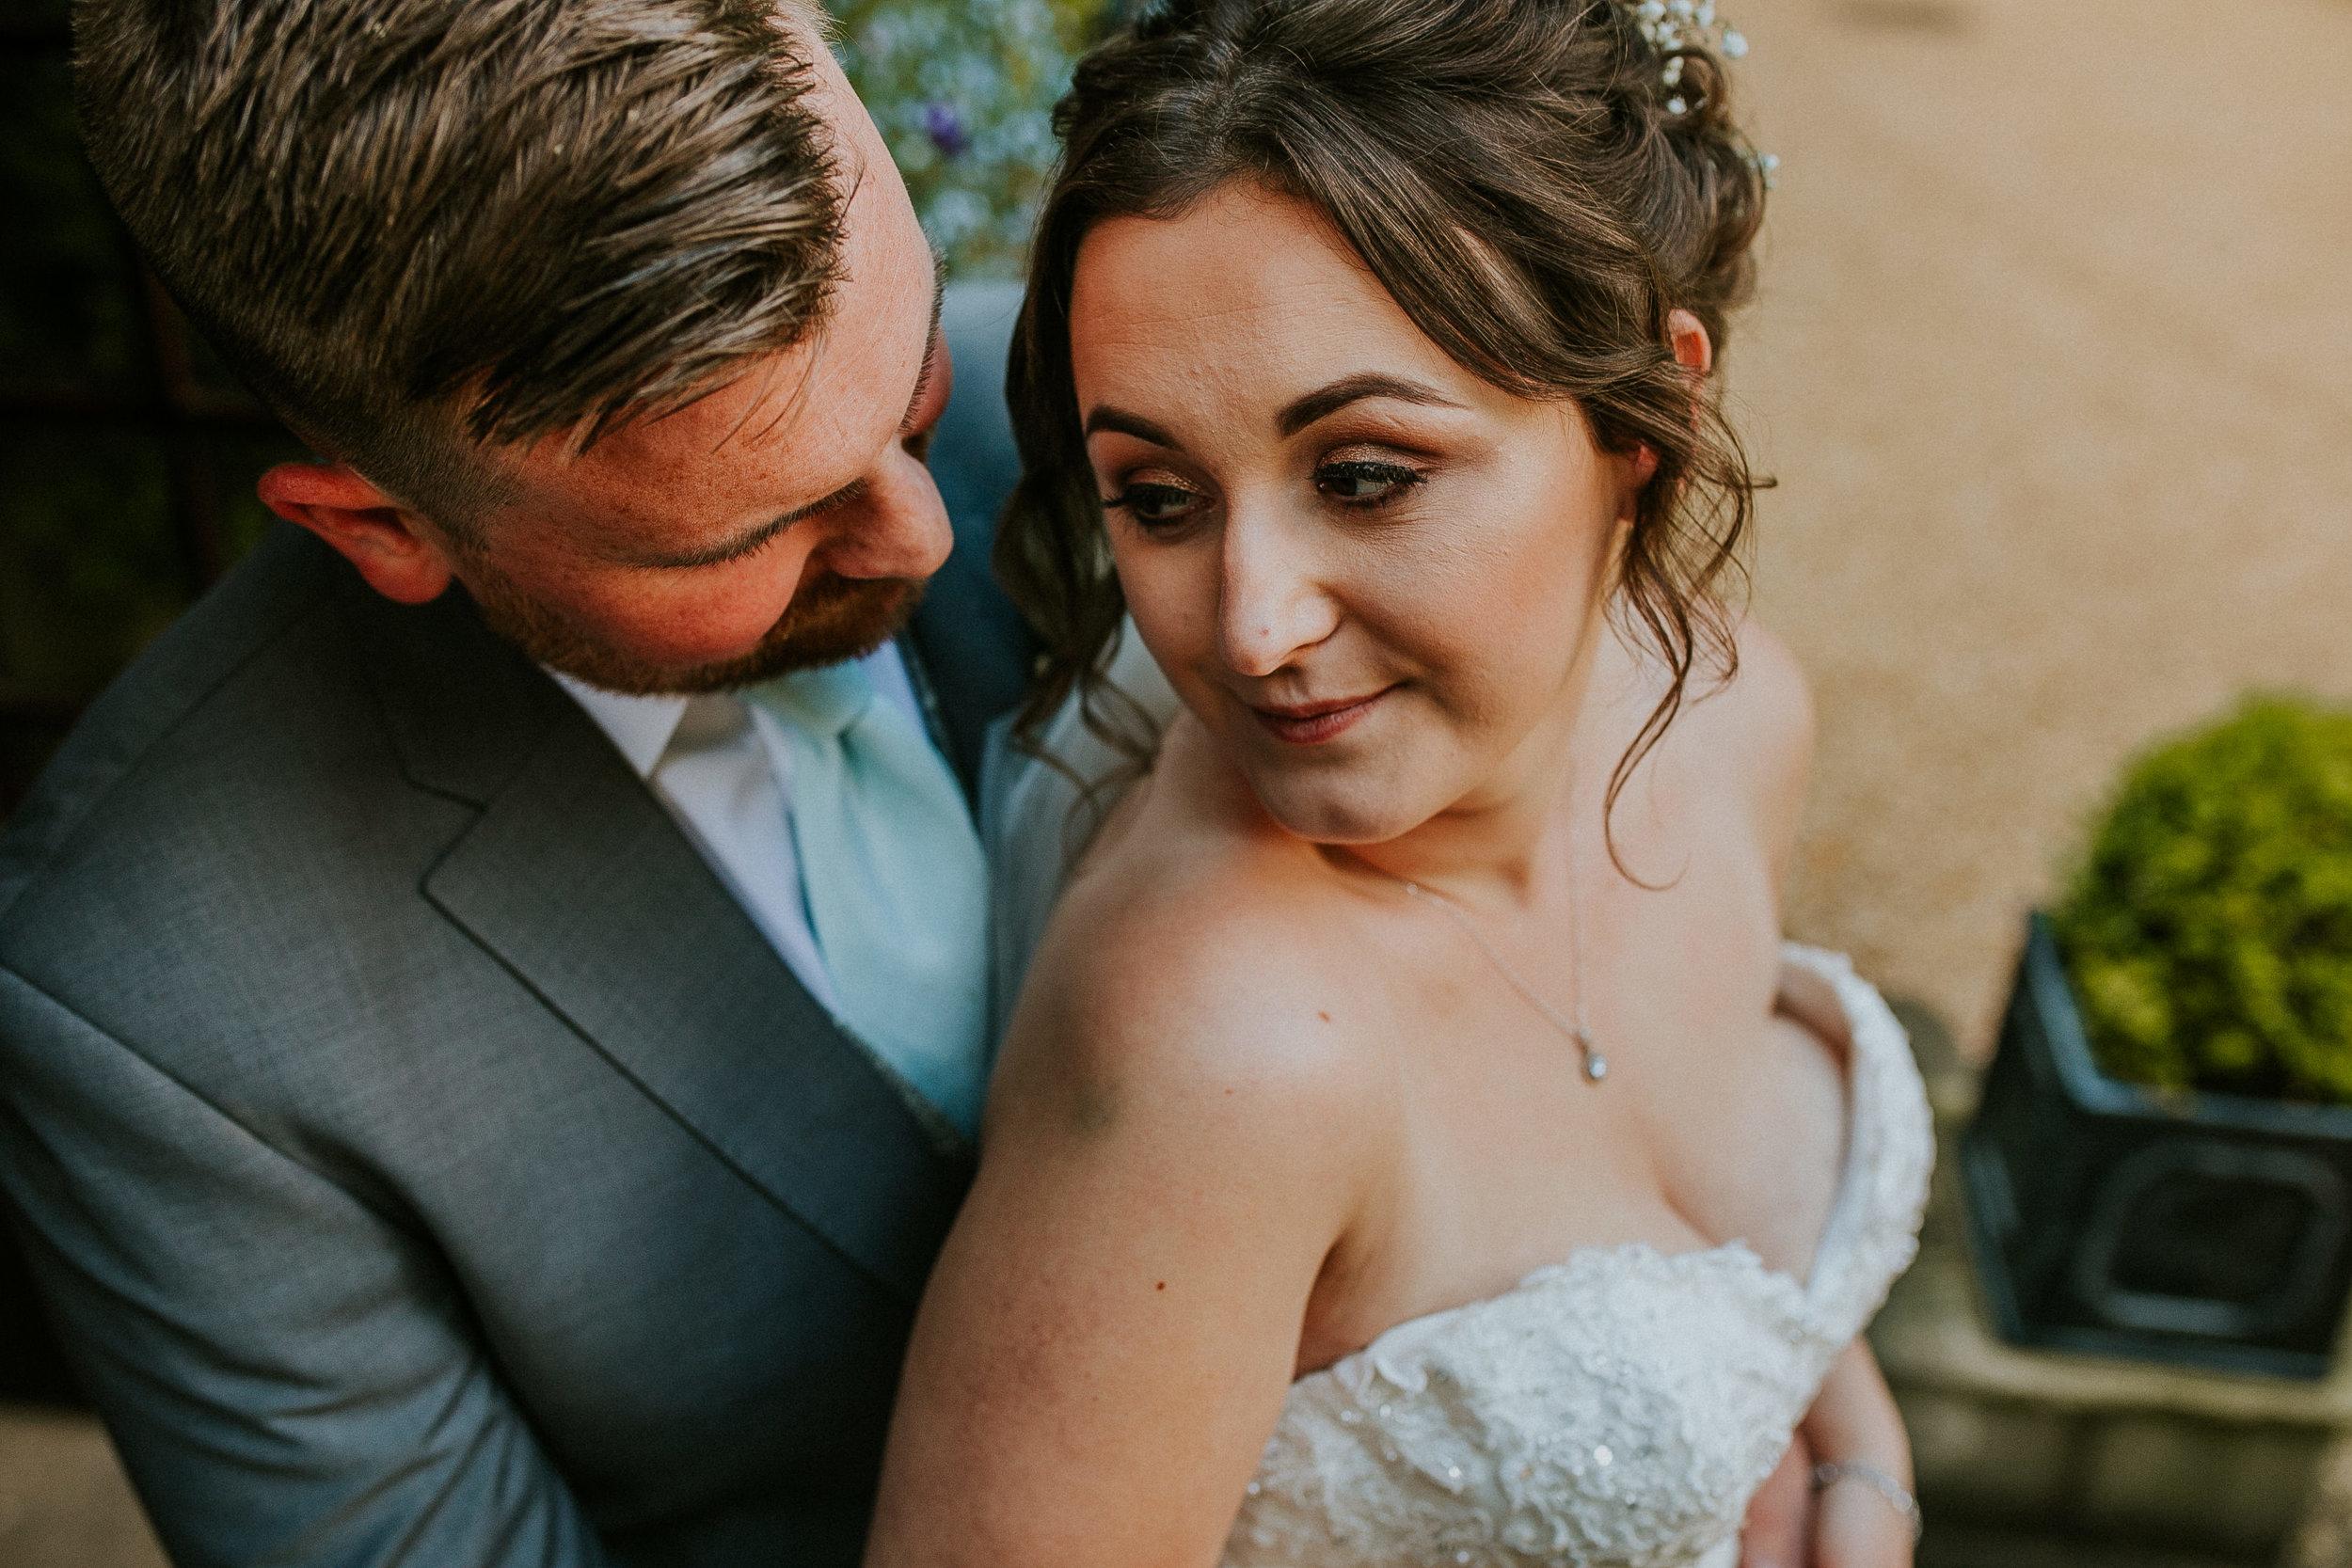 Judes Inn hotel wedding photography